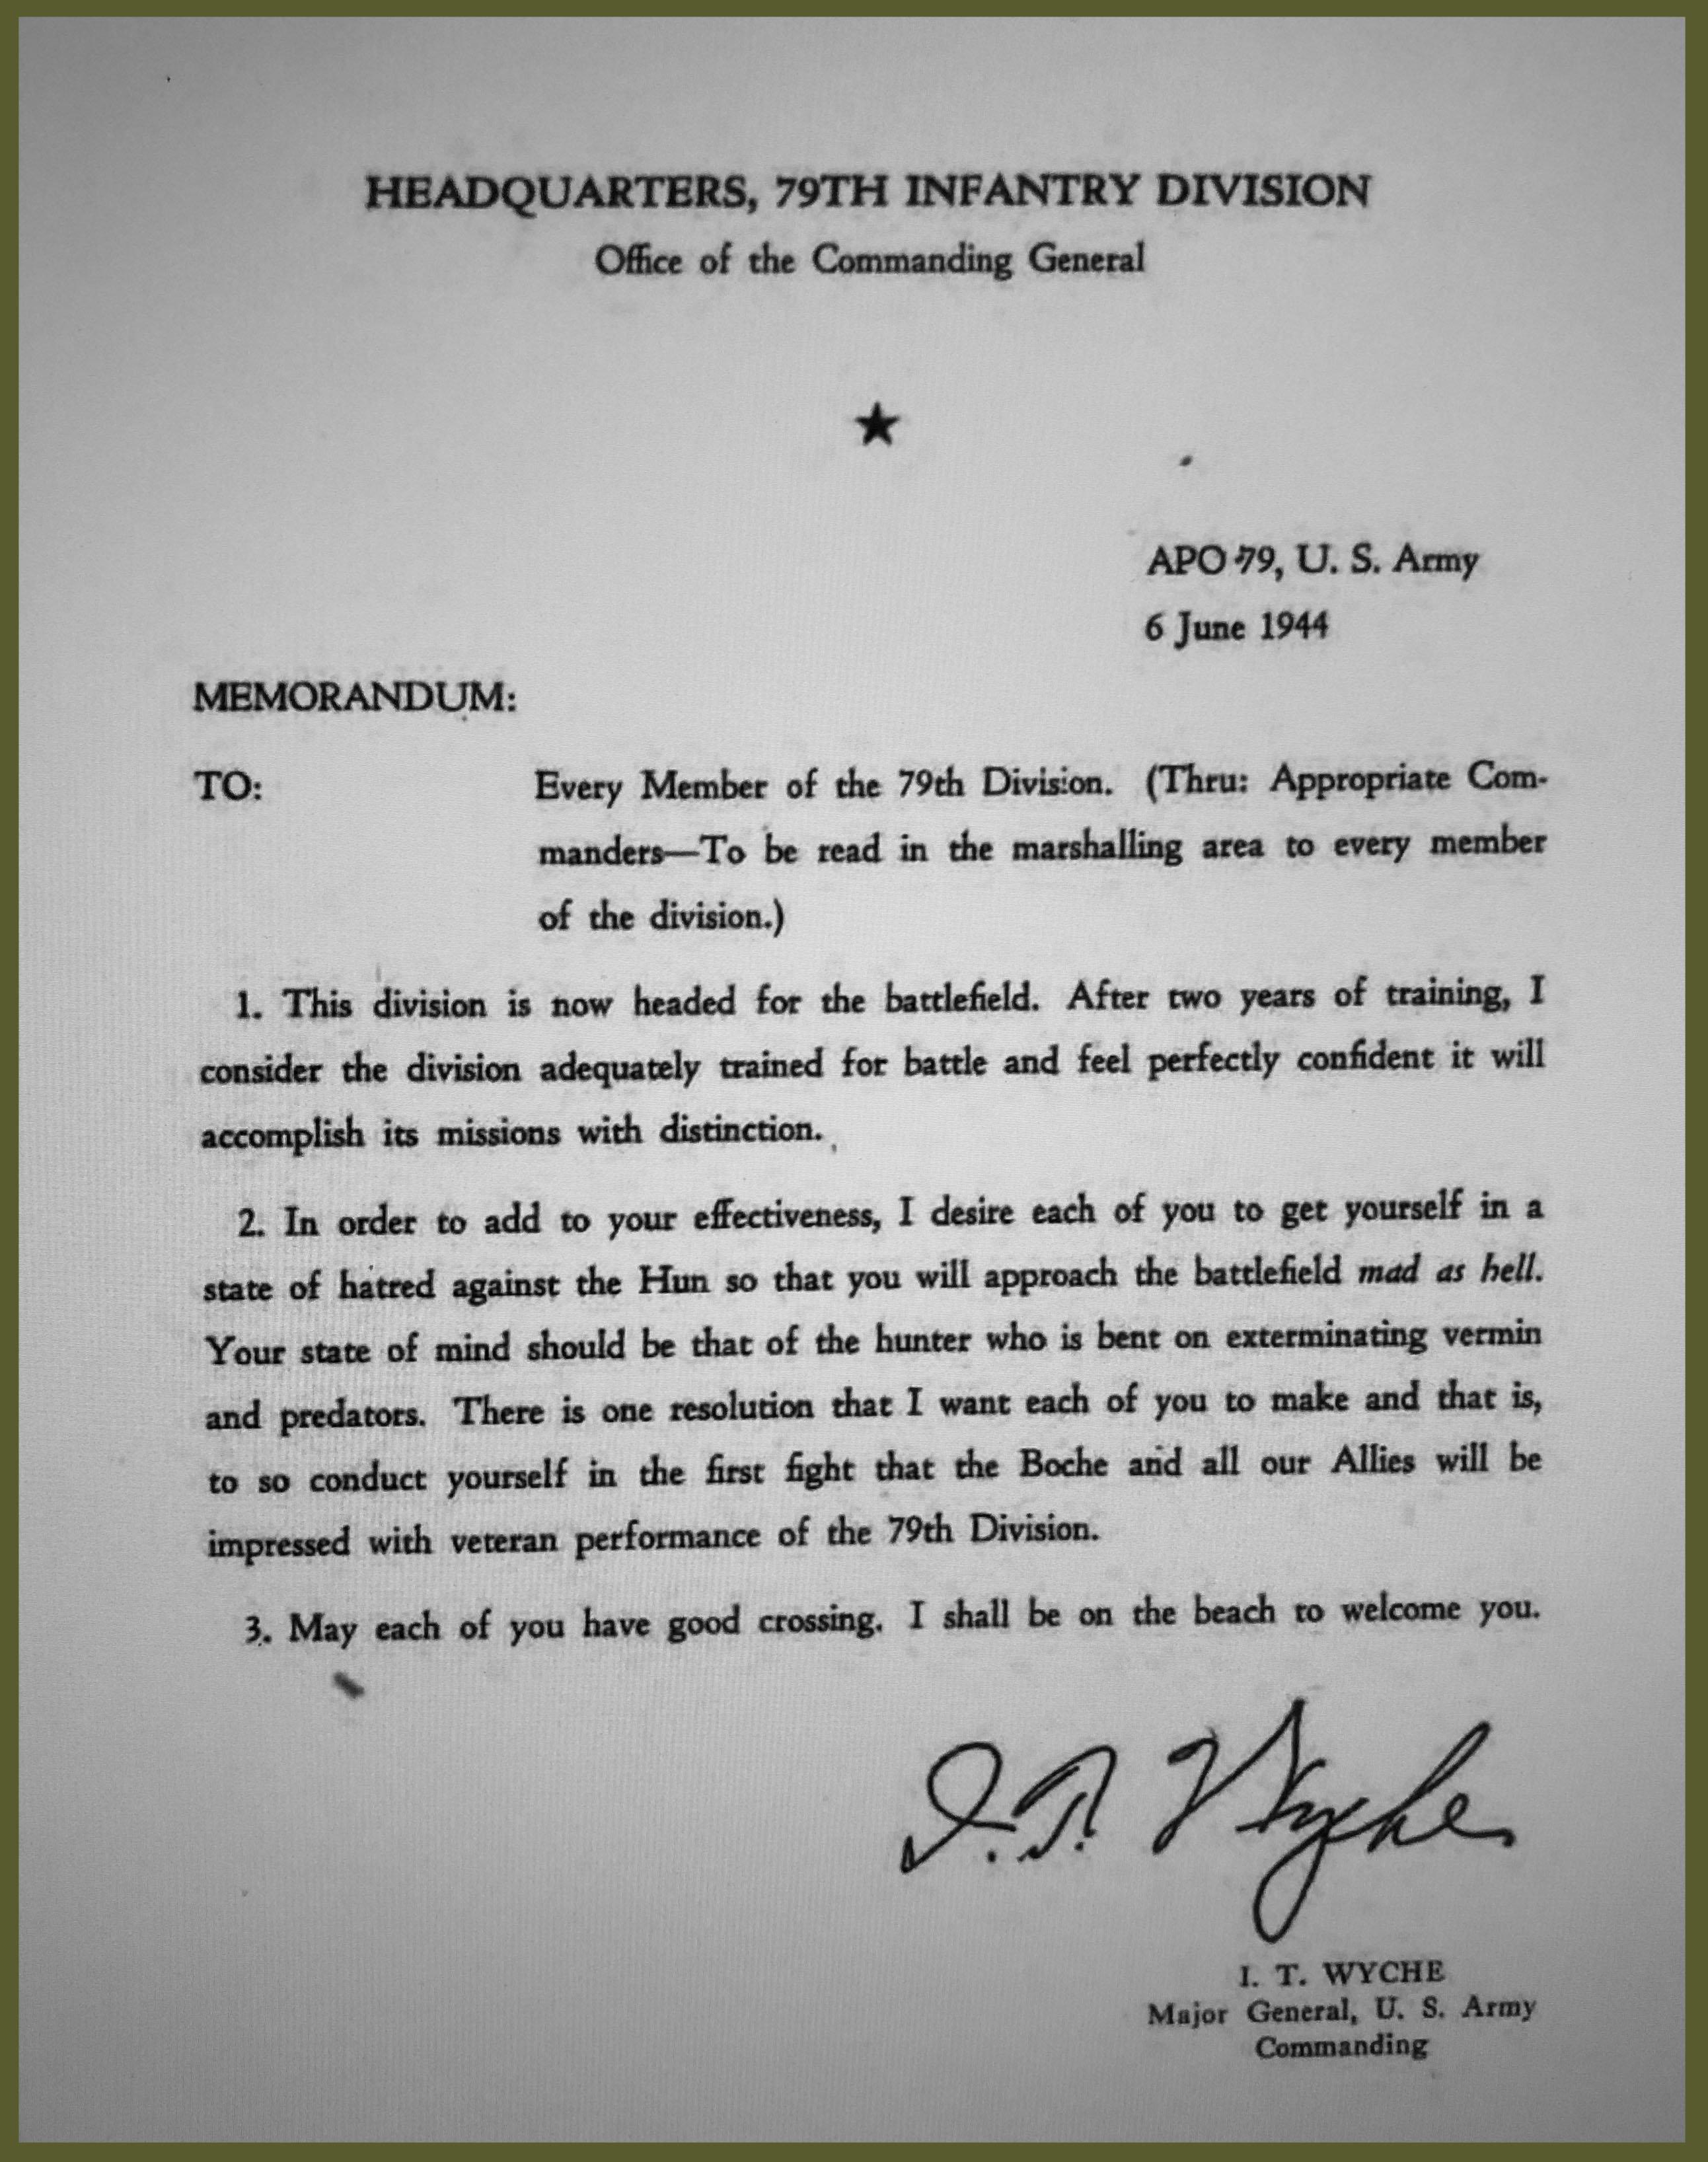 Major General L. T. Wyche order of mission 6 June 1944